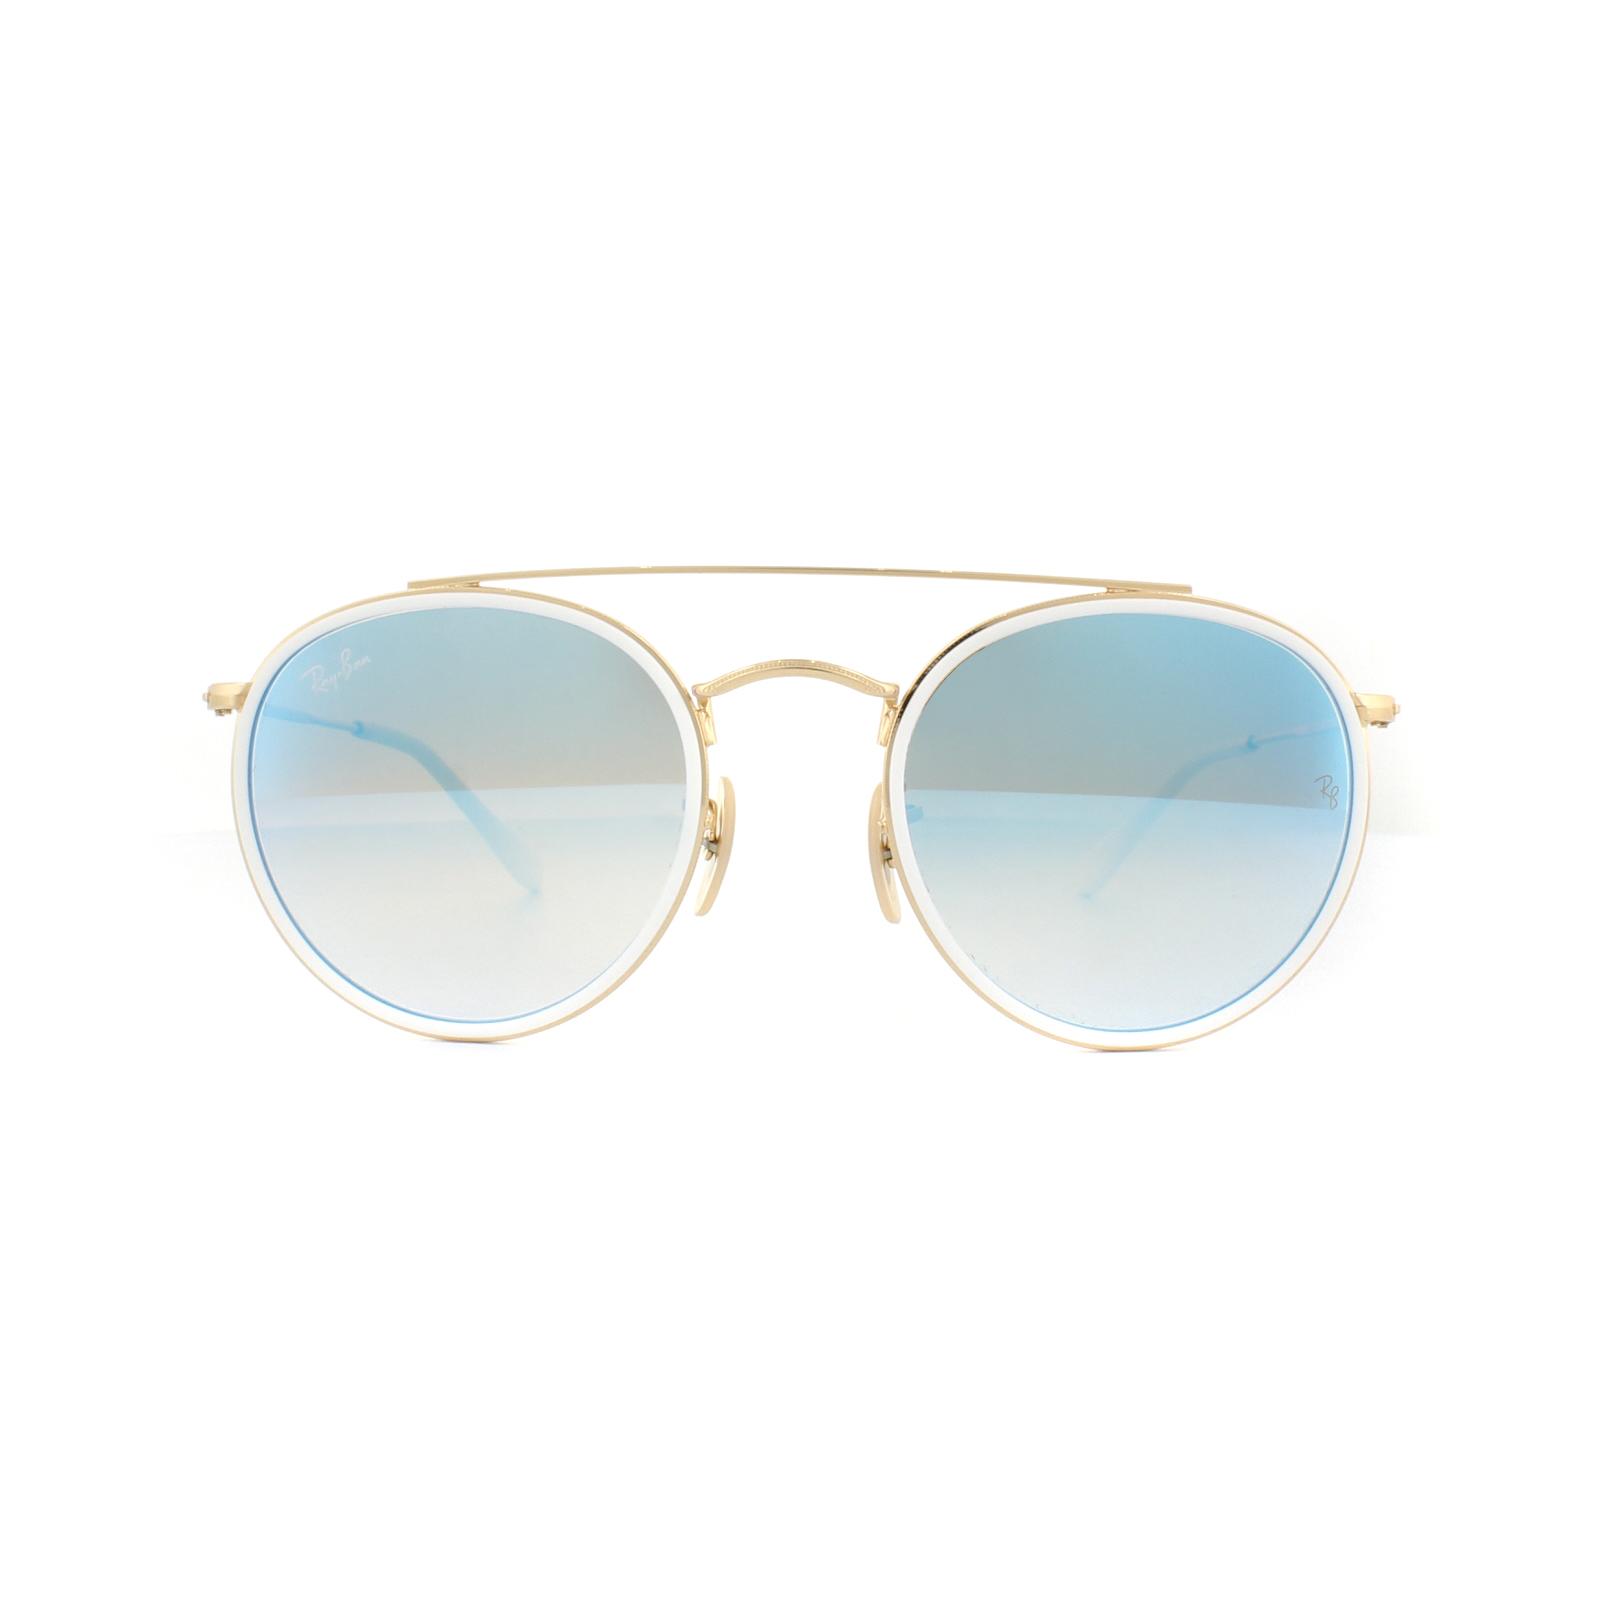 52ae71b1417967 Sentinel Ray-Ban Sunglasses Round Double Bridge 3647N 001 4O Gold Blue  Gradient Mirror